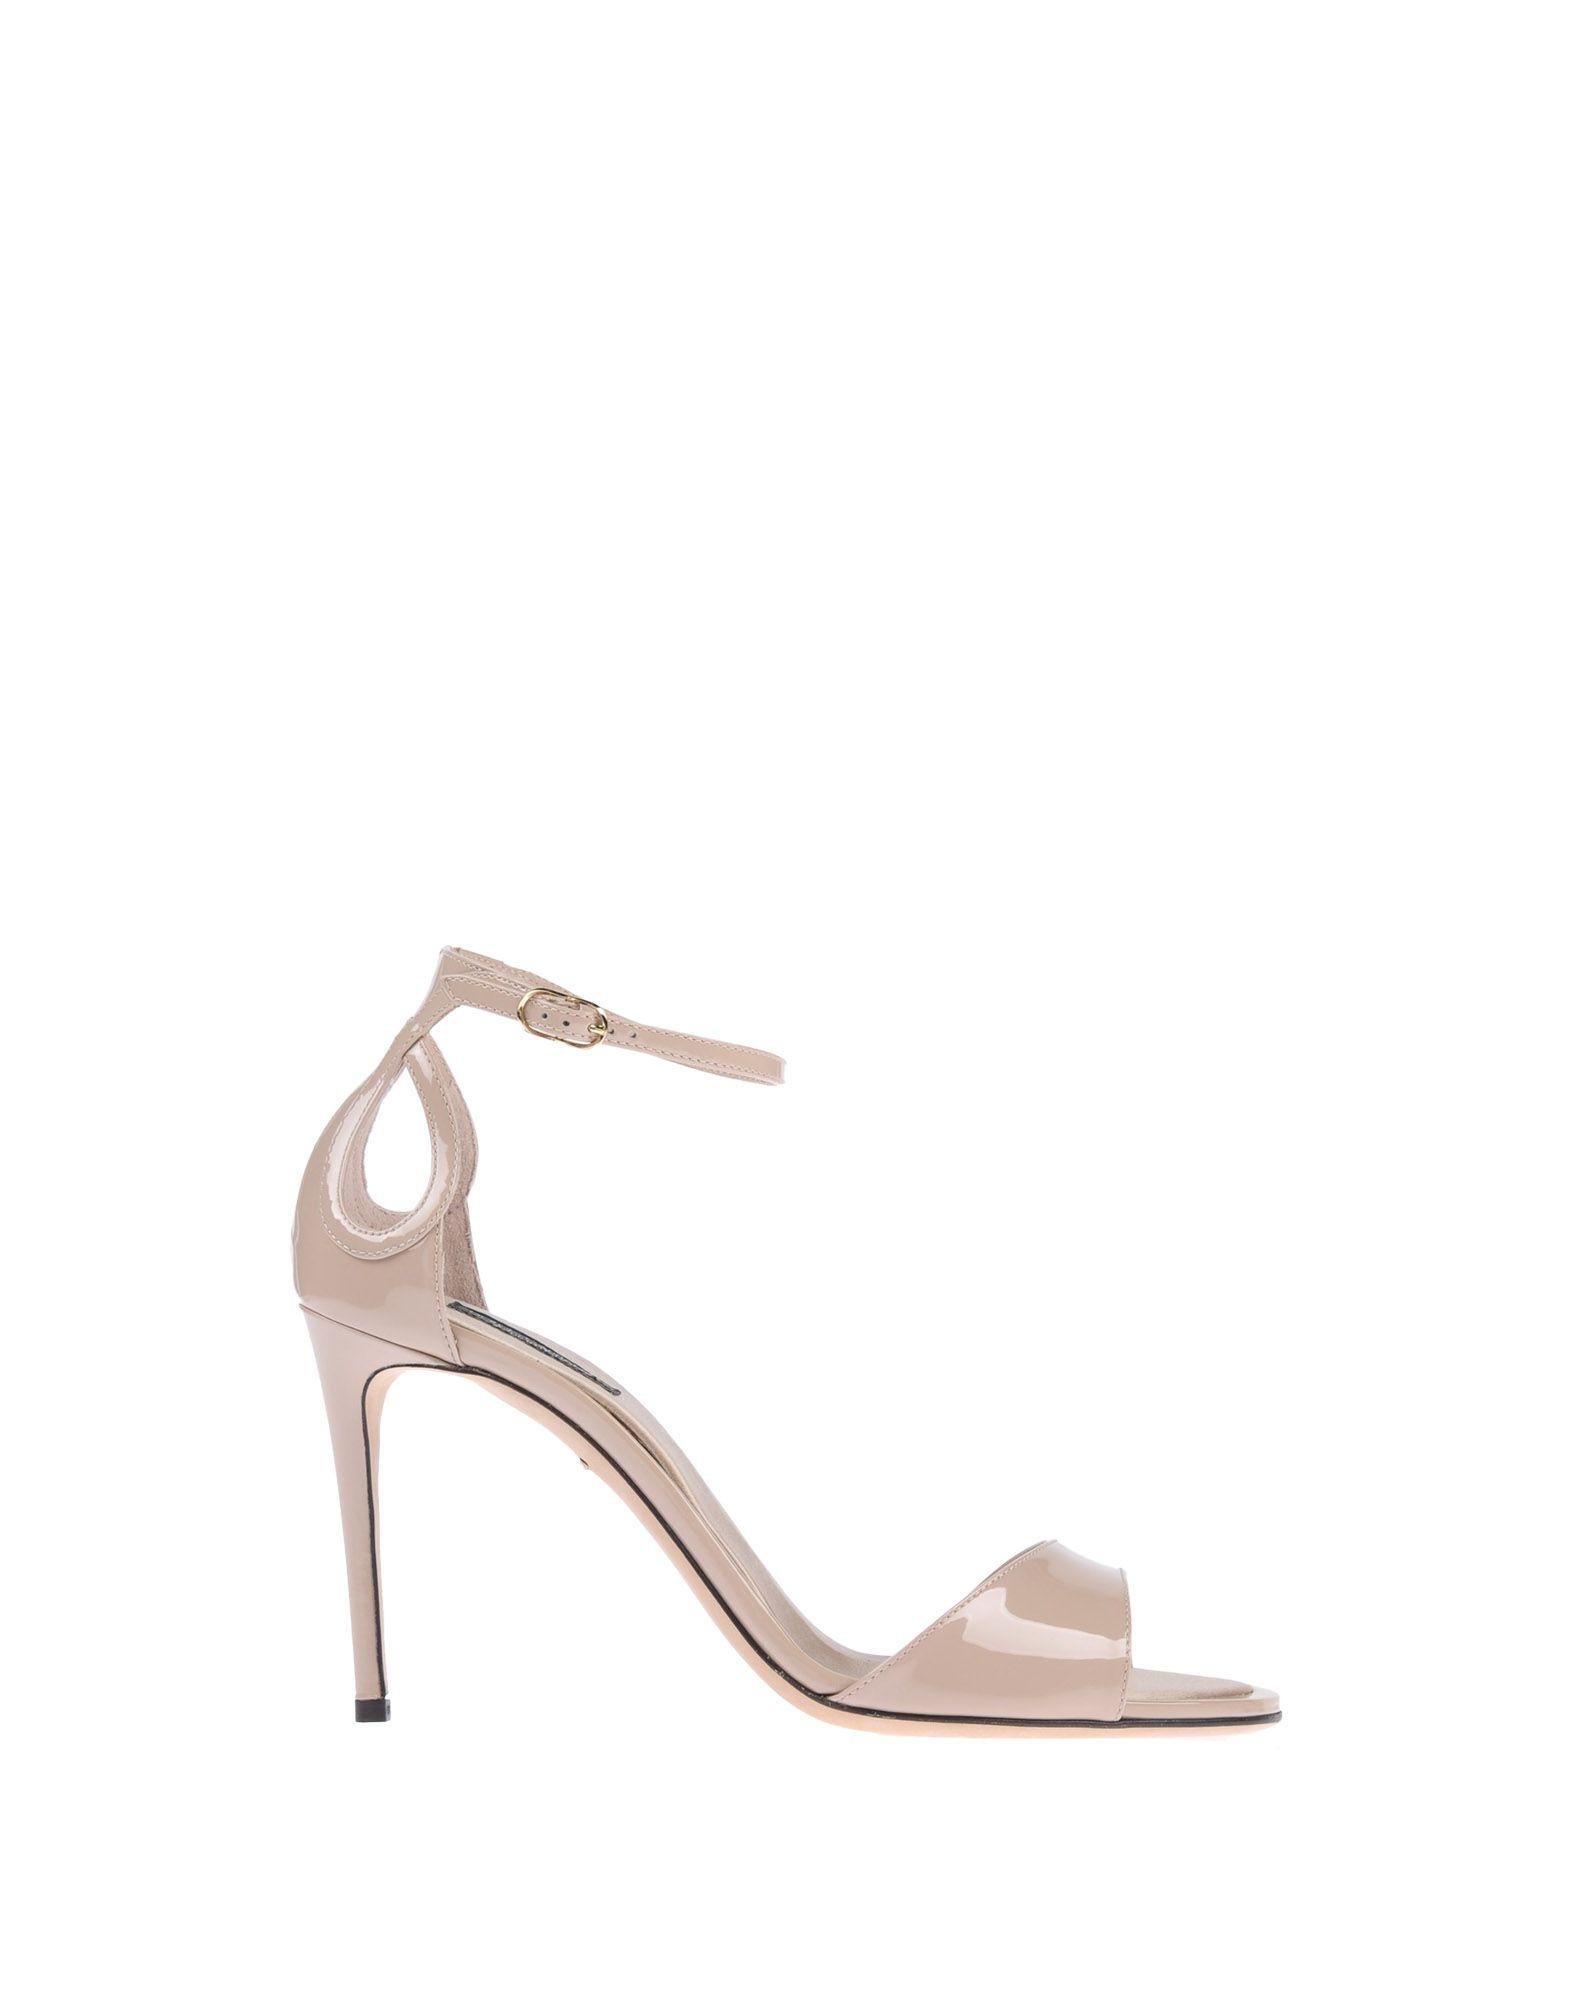 Dolce & Gabbana Sandalen Damen  11488463WI Neue Schuhe